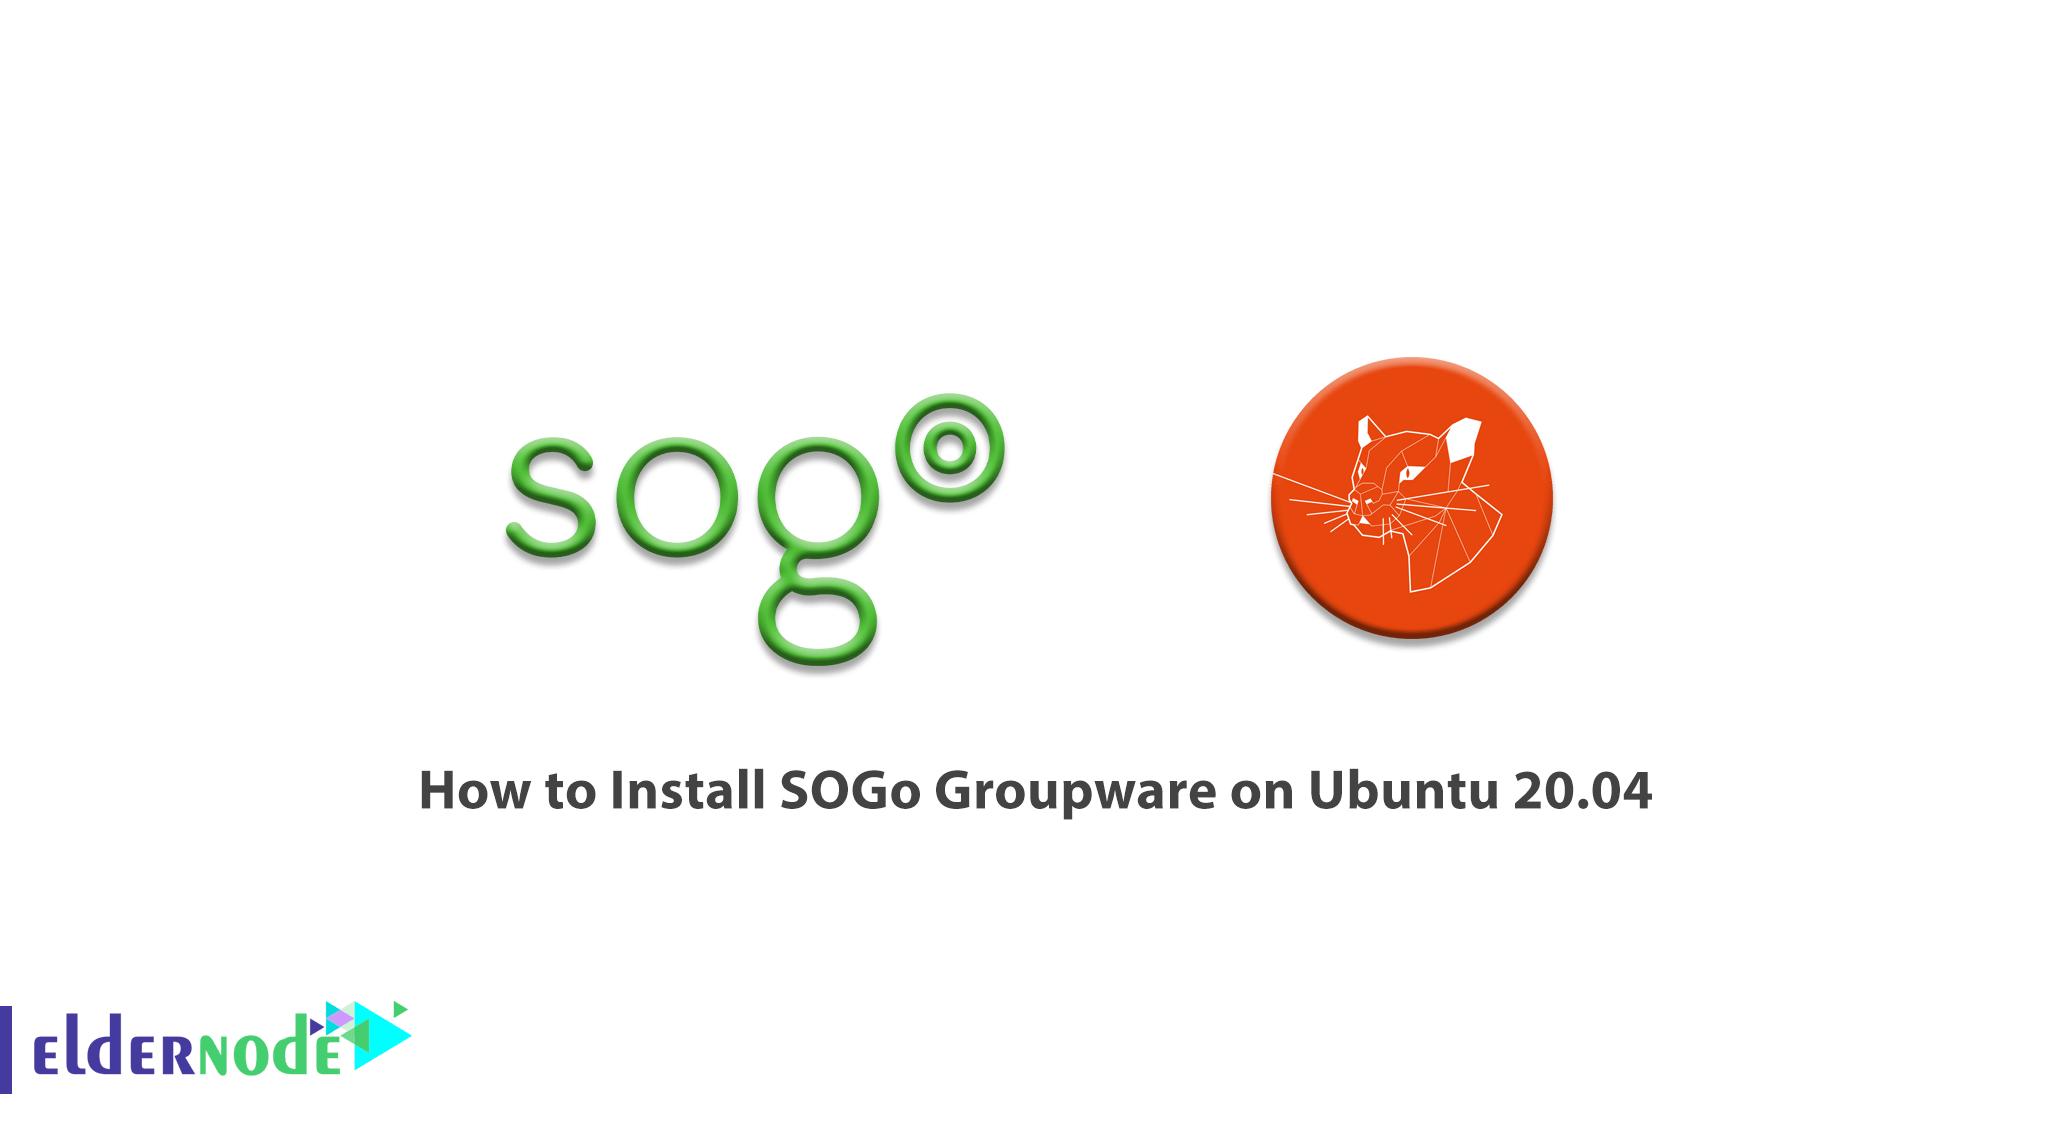 How to Install SOGo Groupware on Ubuntu 20.04